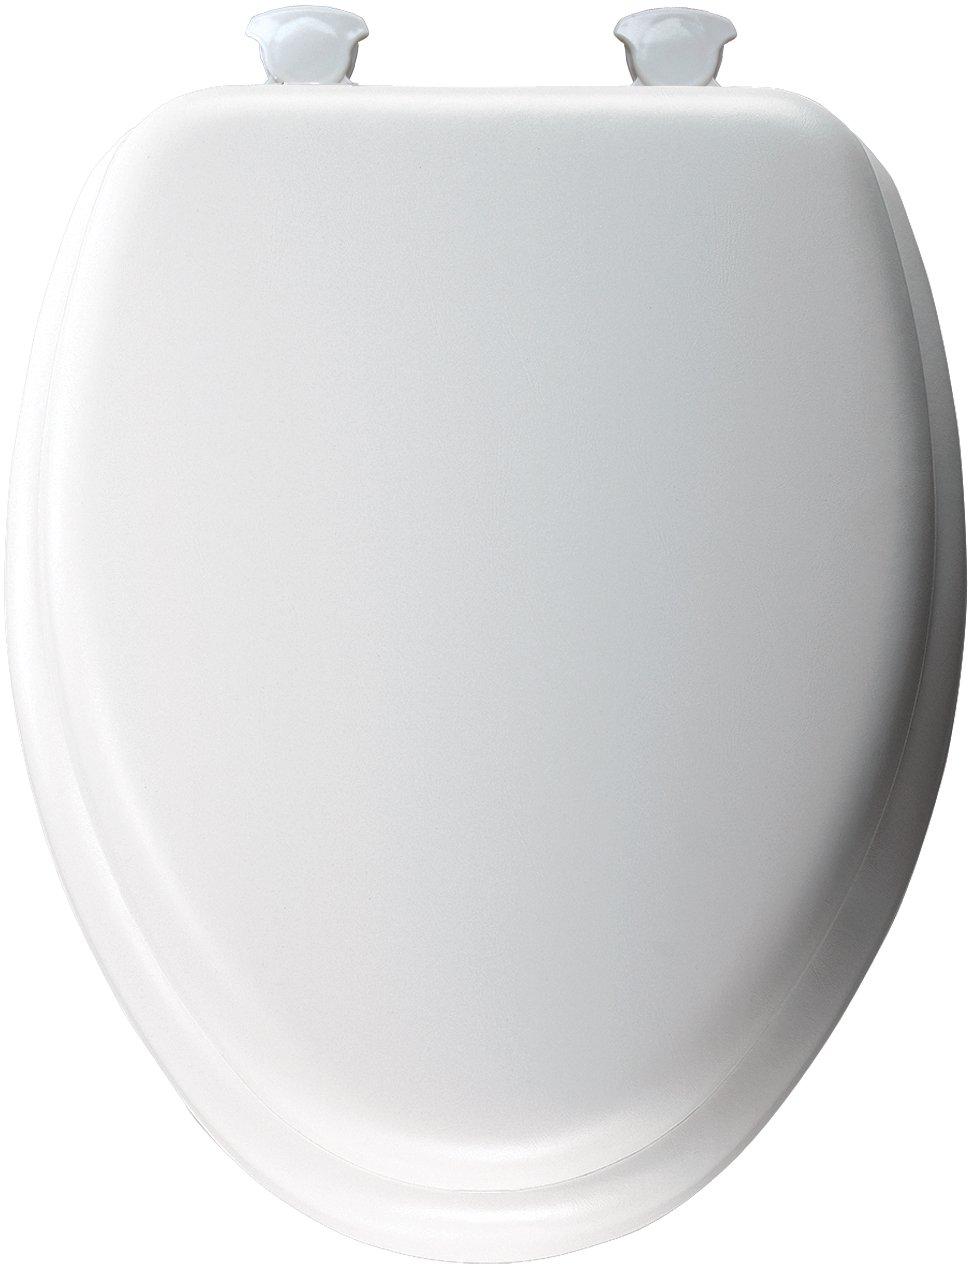 BEMIS Soft Elongated Closed Front Toilet Seat White 113EC 000 Easy Change Hin